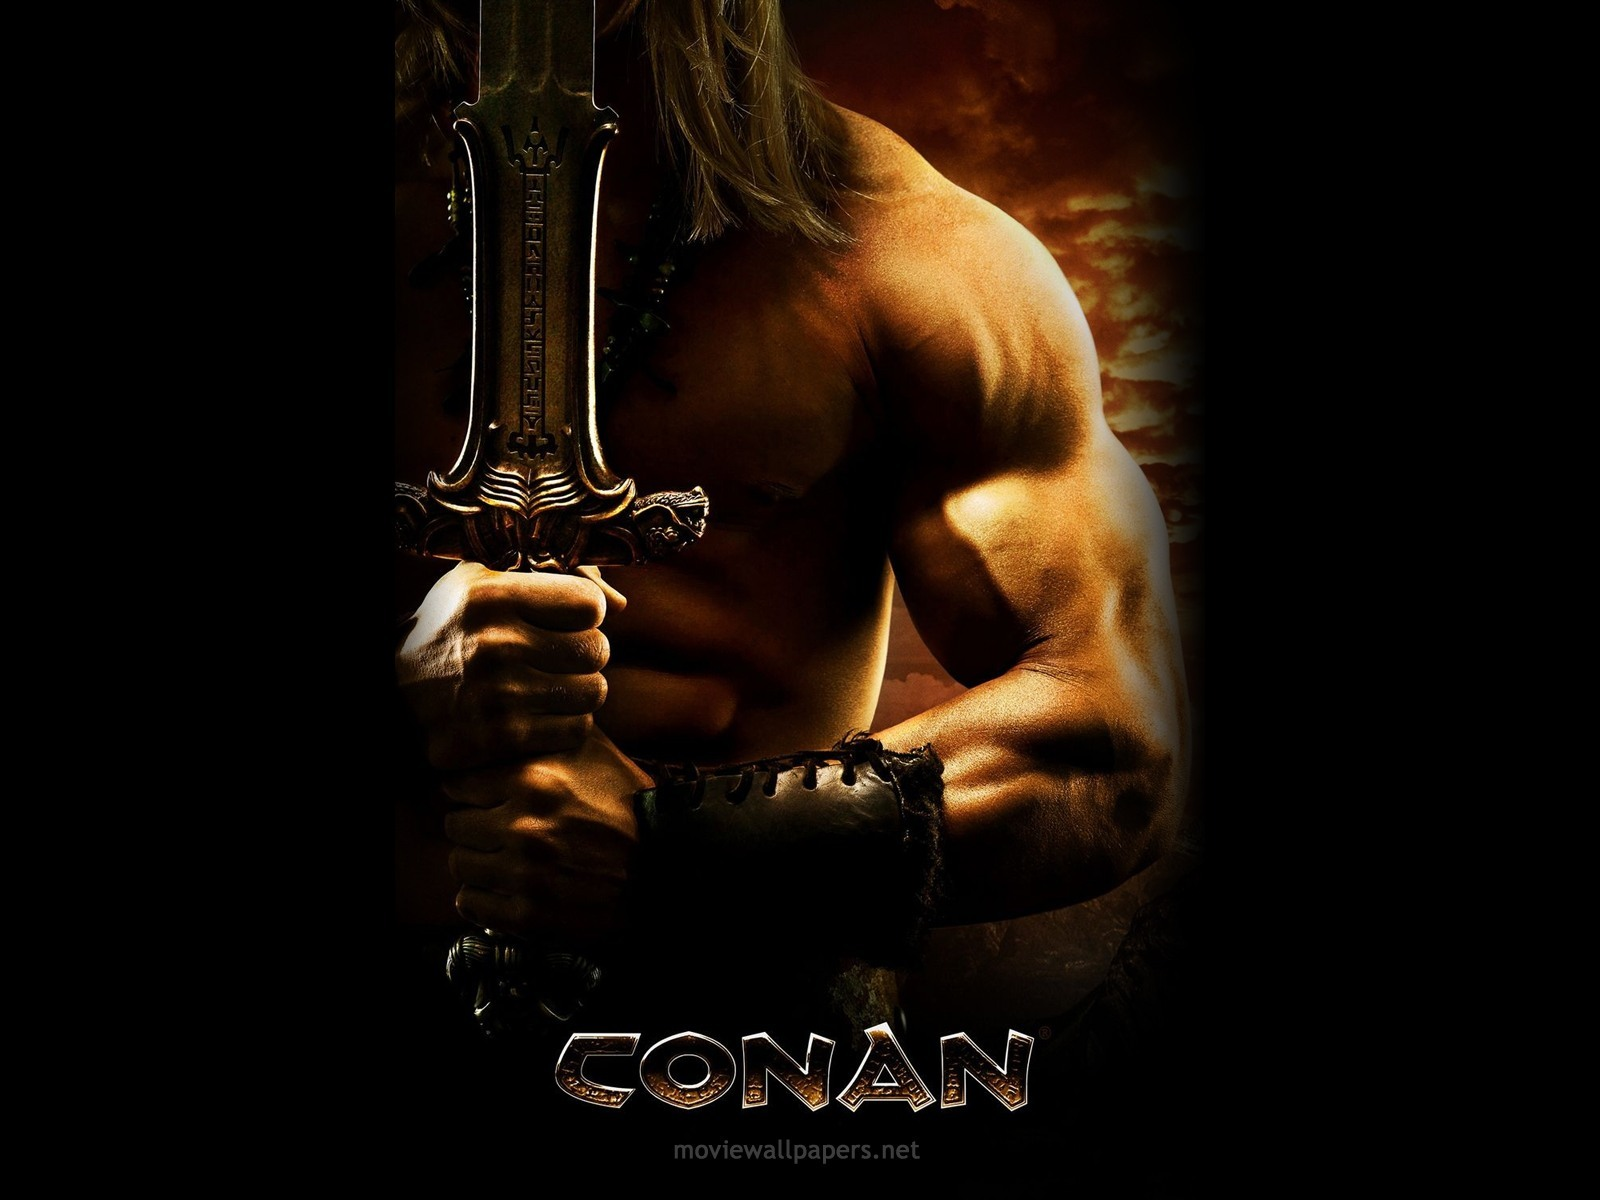 HD wallpapers Conan the Barbarian wallpaper HD 1600x1200